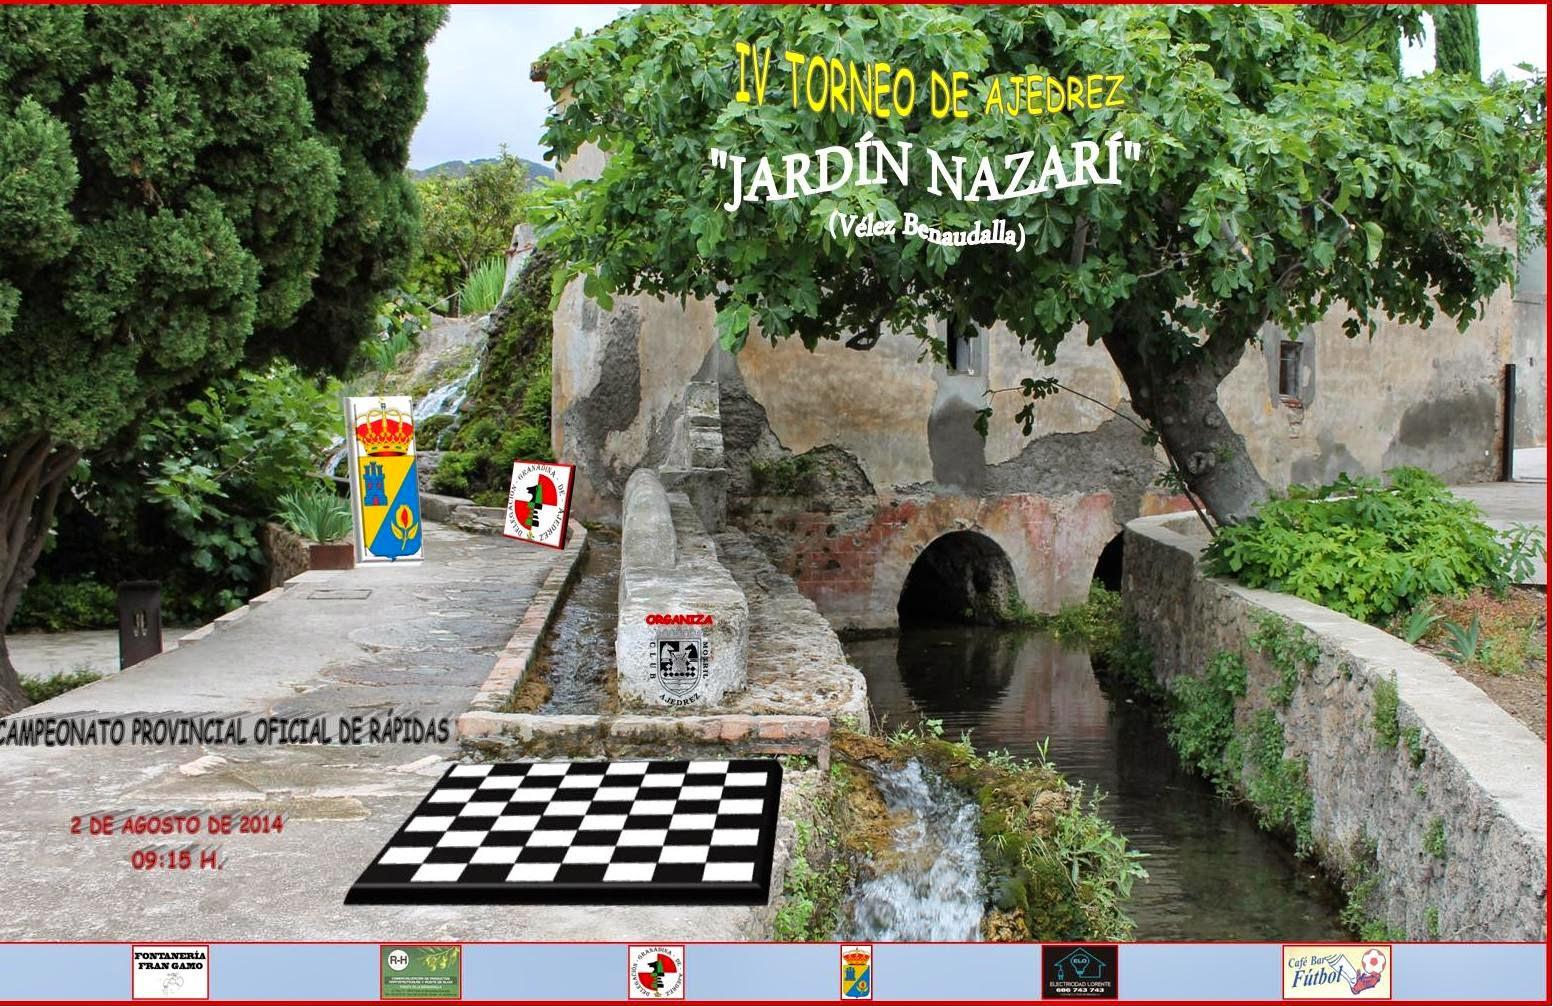 Ajedrez motril iv torneo de ajedrez jard n nazar que for Ajedrea de jardin